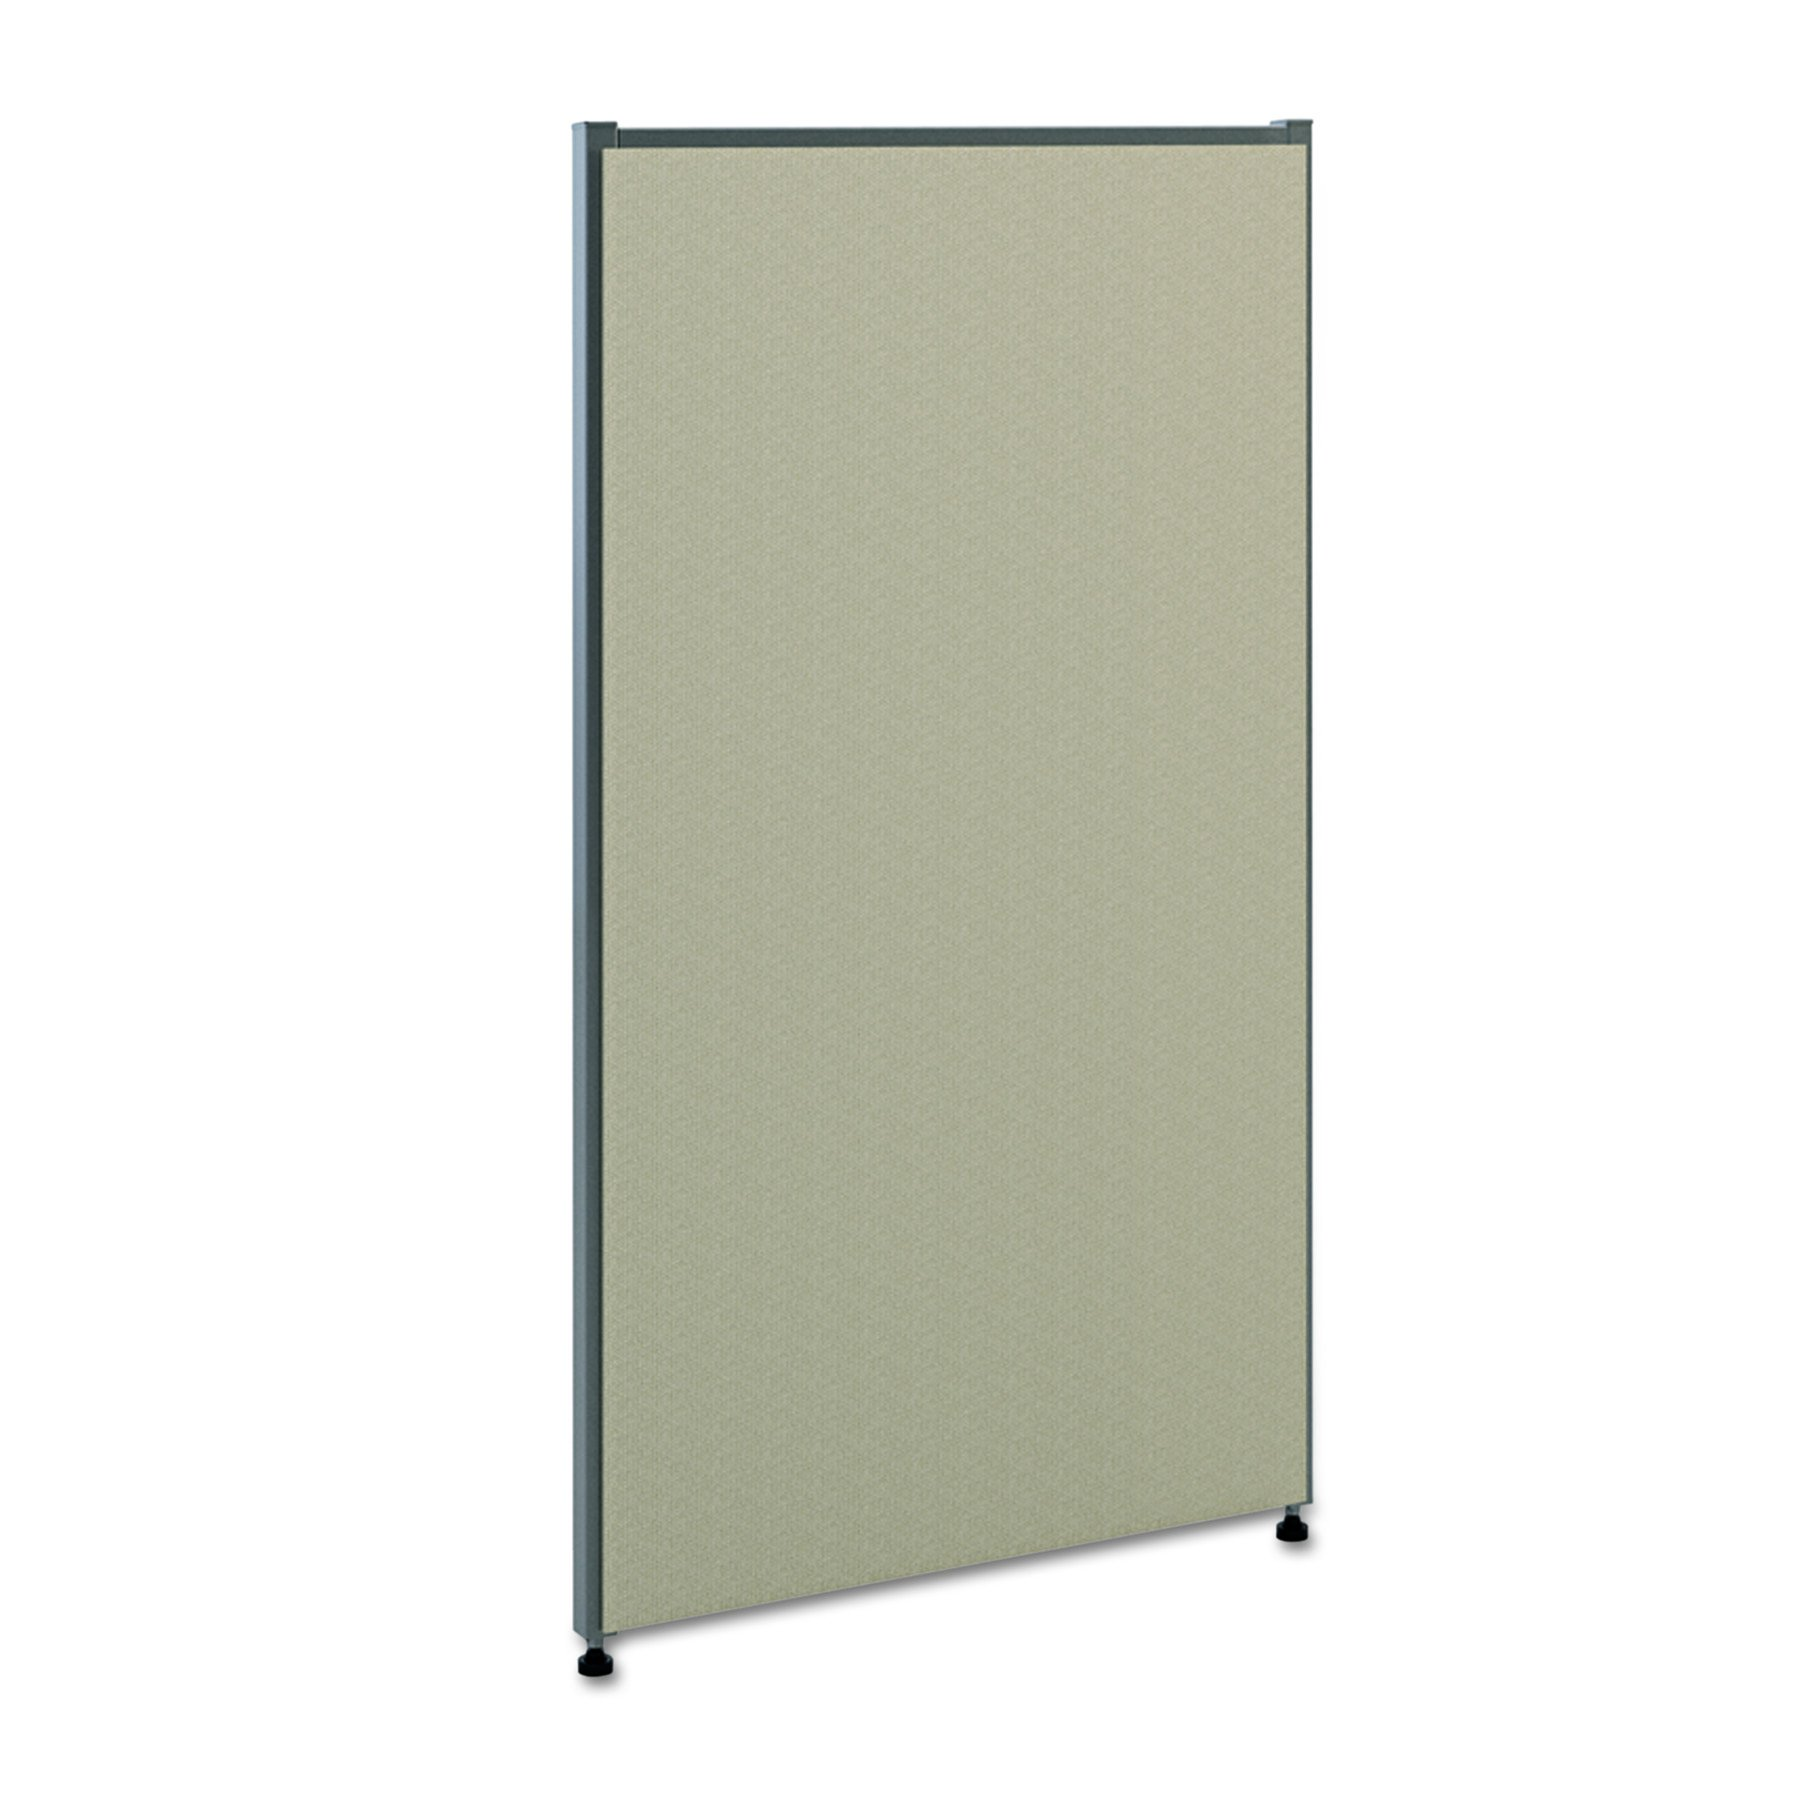 HON Verse Panel, 42'' H x 24'' W, Light Gray Finish, Gray Fabric